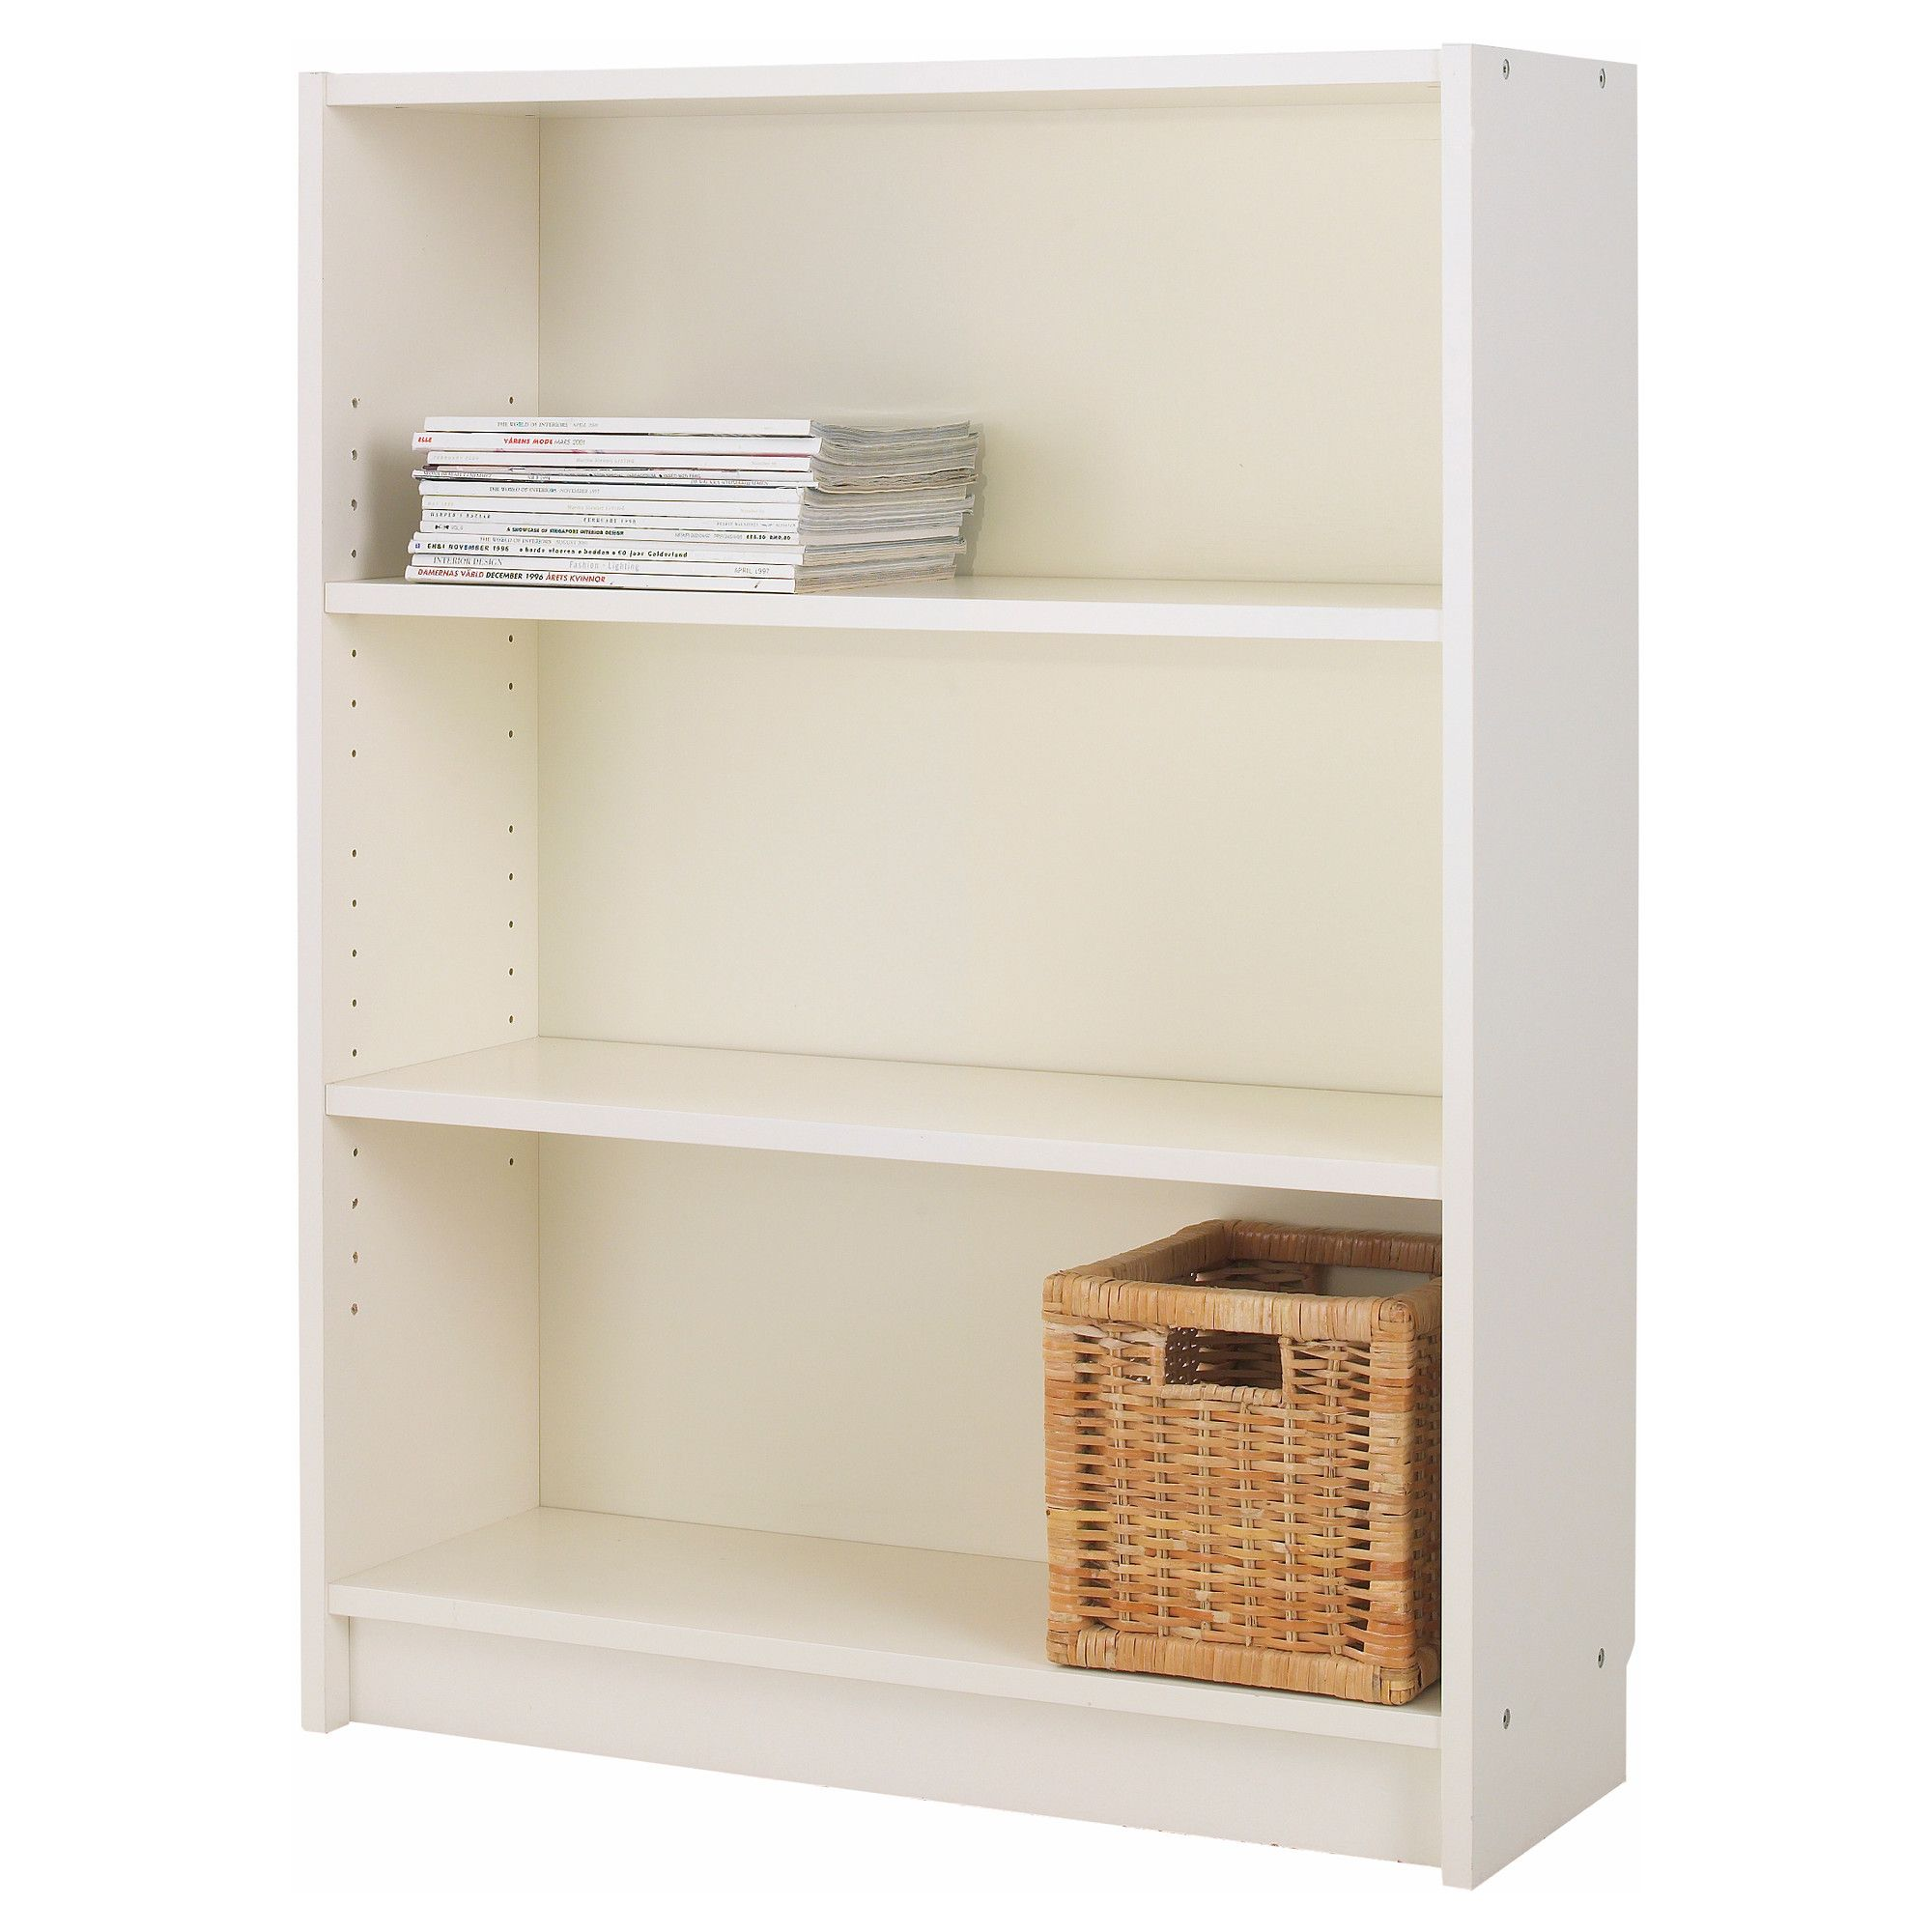 Billy Bücherregal Ikea verkauft billy bücherregal weiß ikea kidsroom